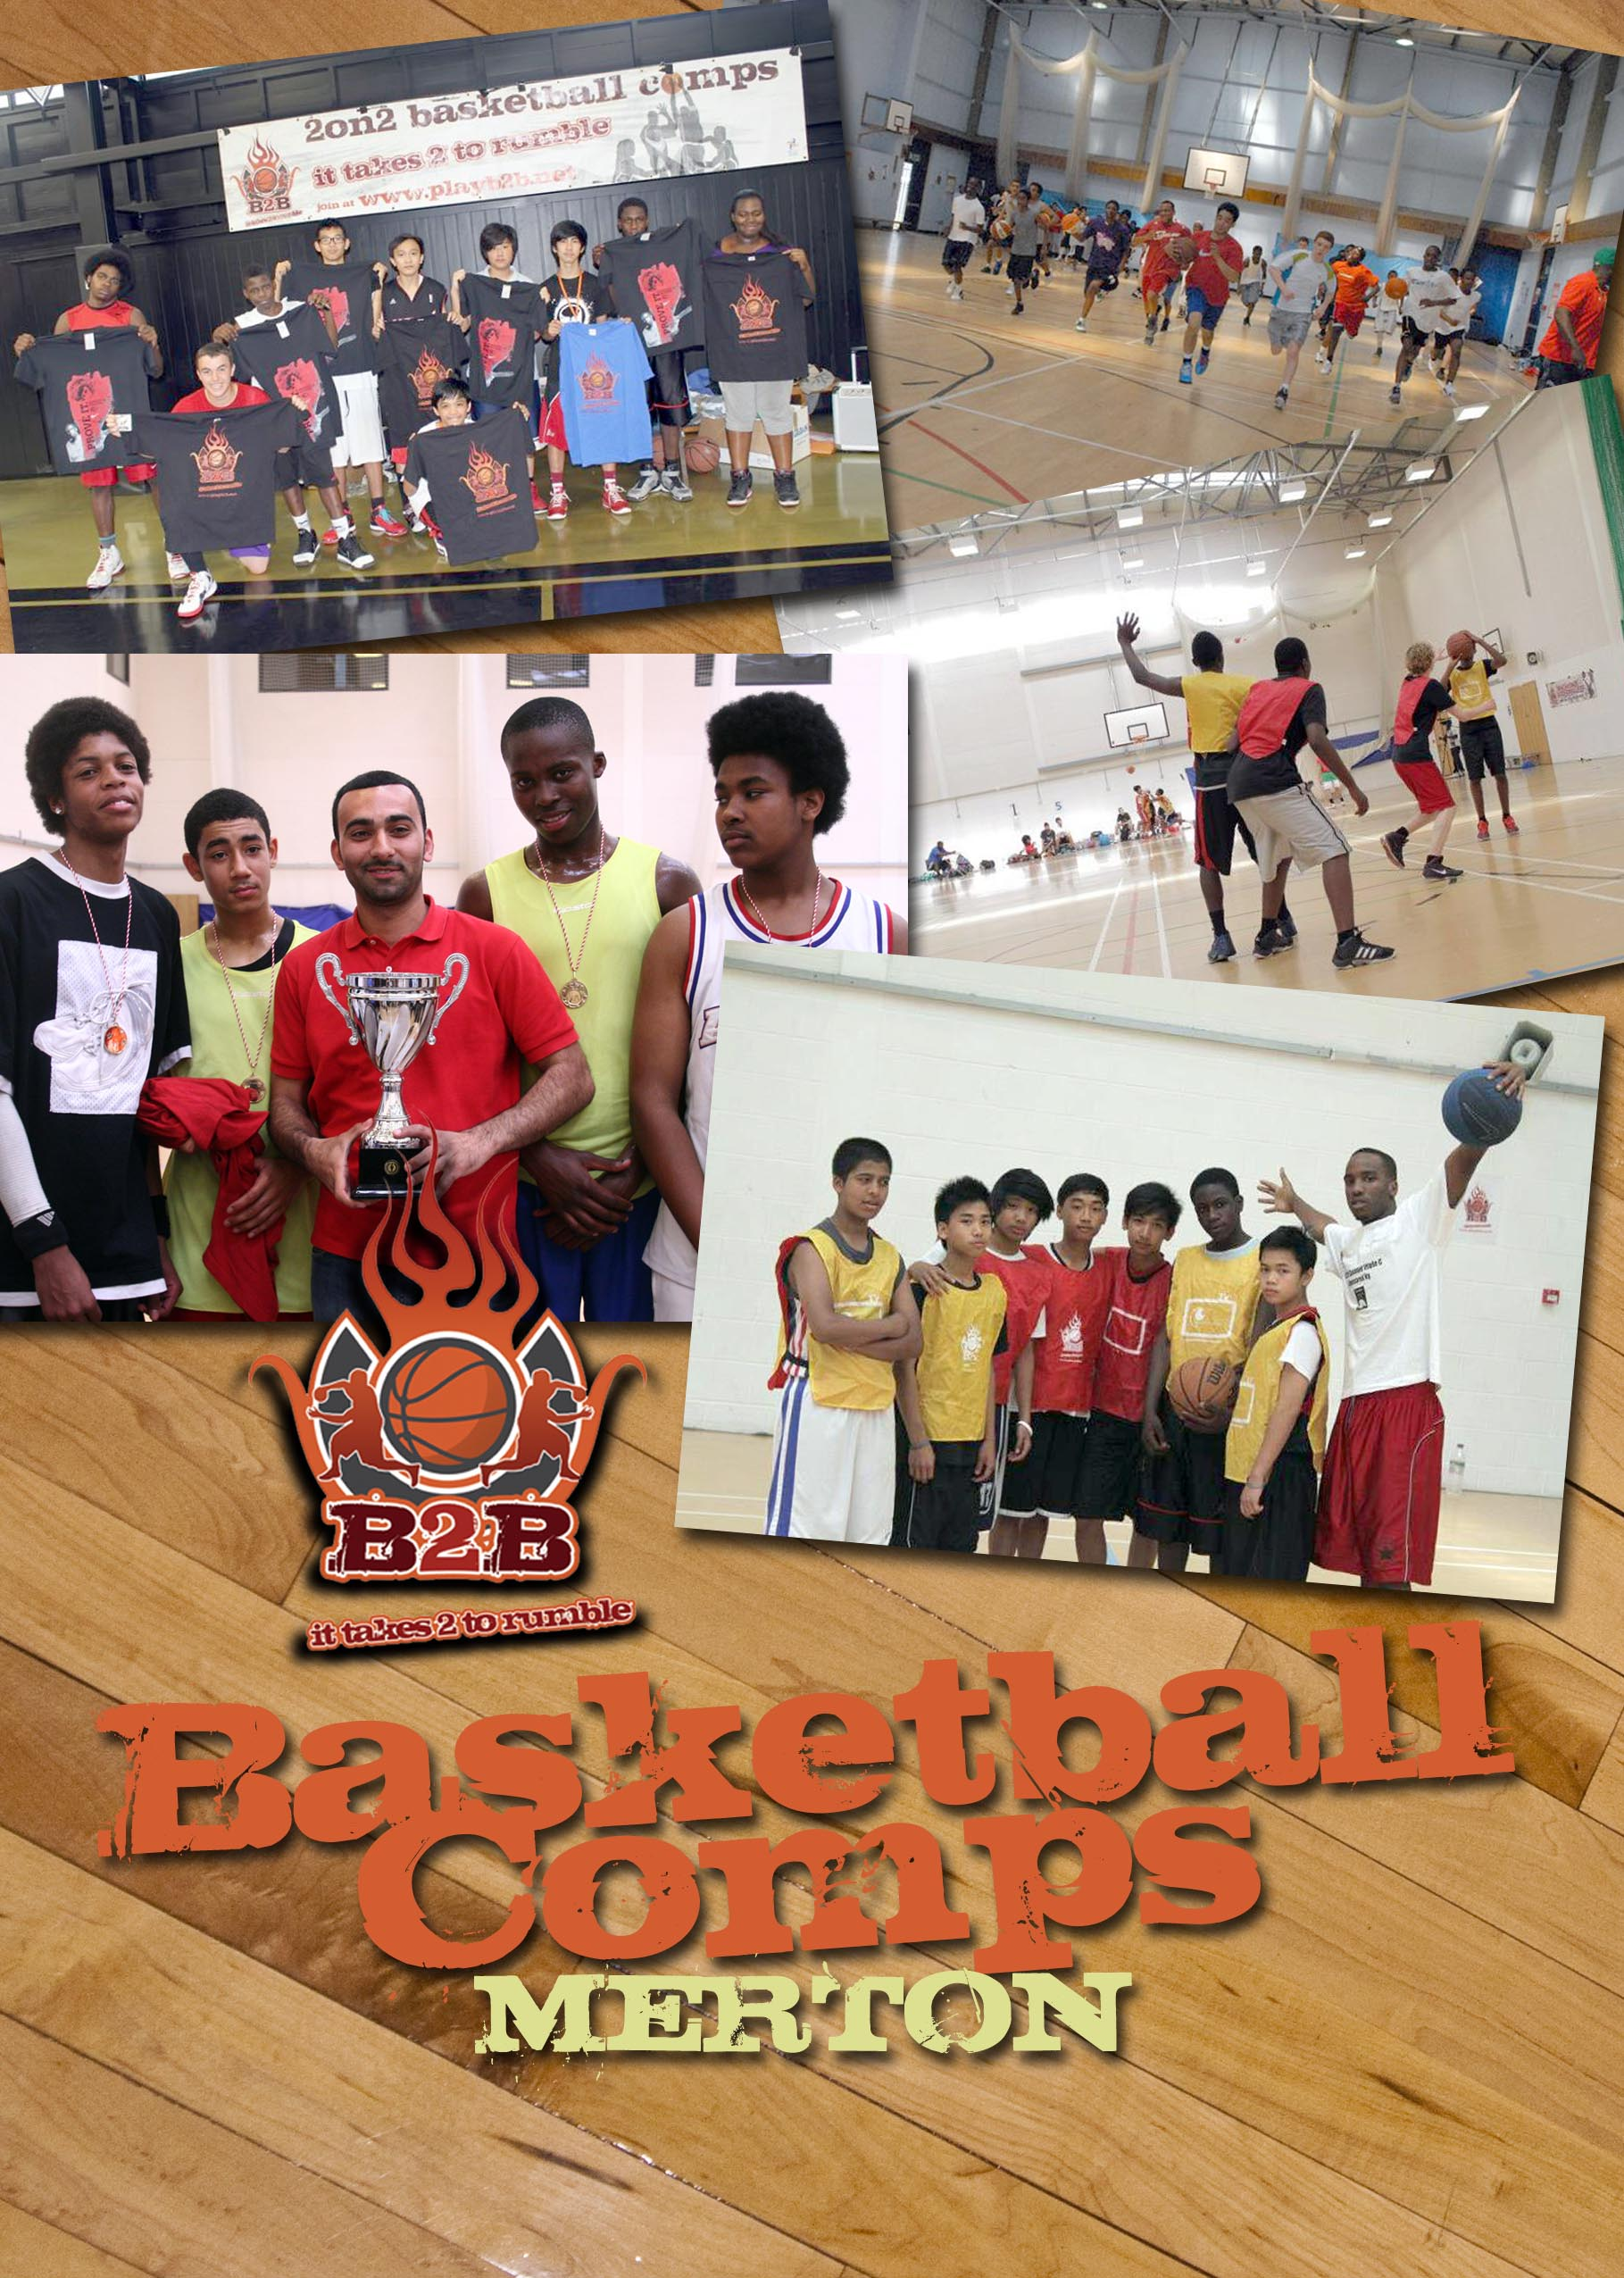 Basketball Comps Merton 2012